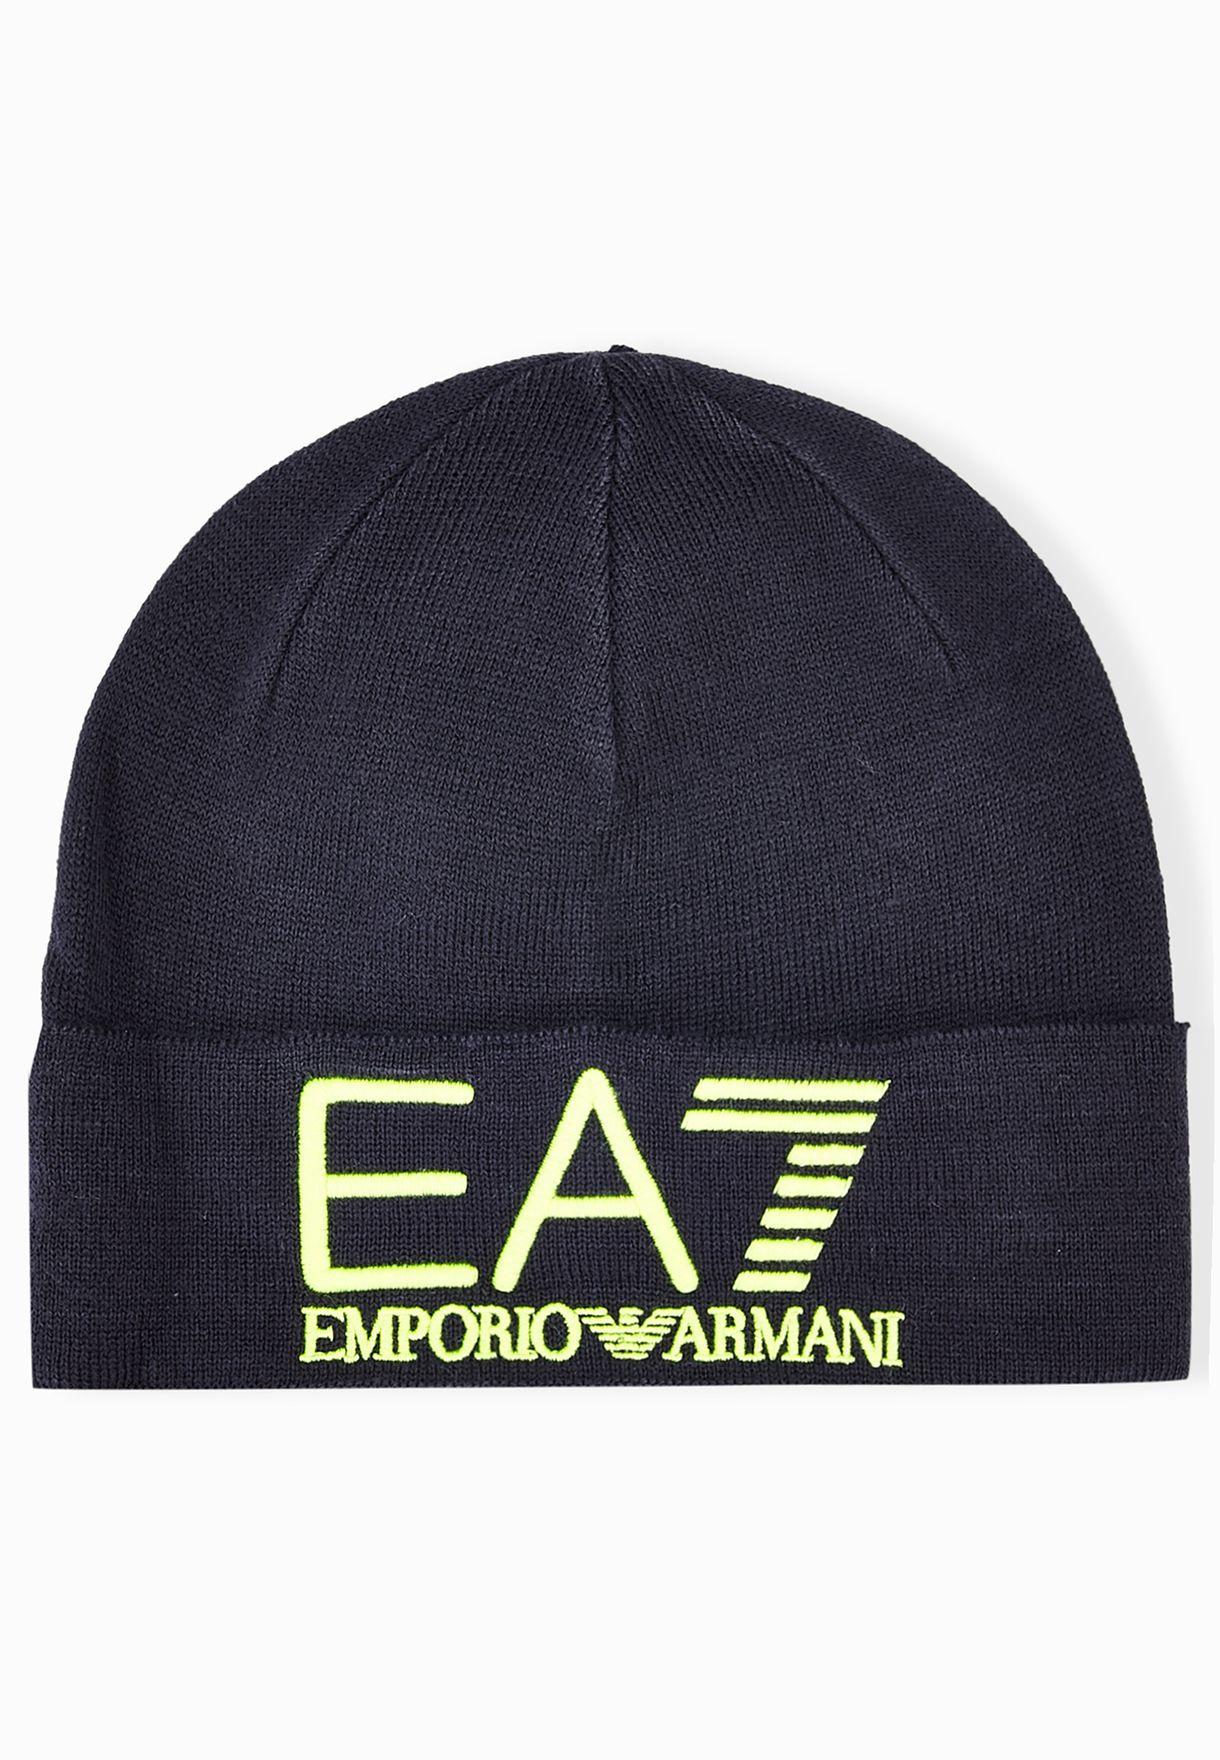 d92d68172a0 Shop Ea7 Emporio Armani blue Beanie Hat 5A392-275555-02836 for Men in Qatar  - EA531AT19DRC